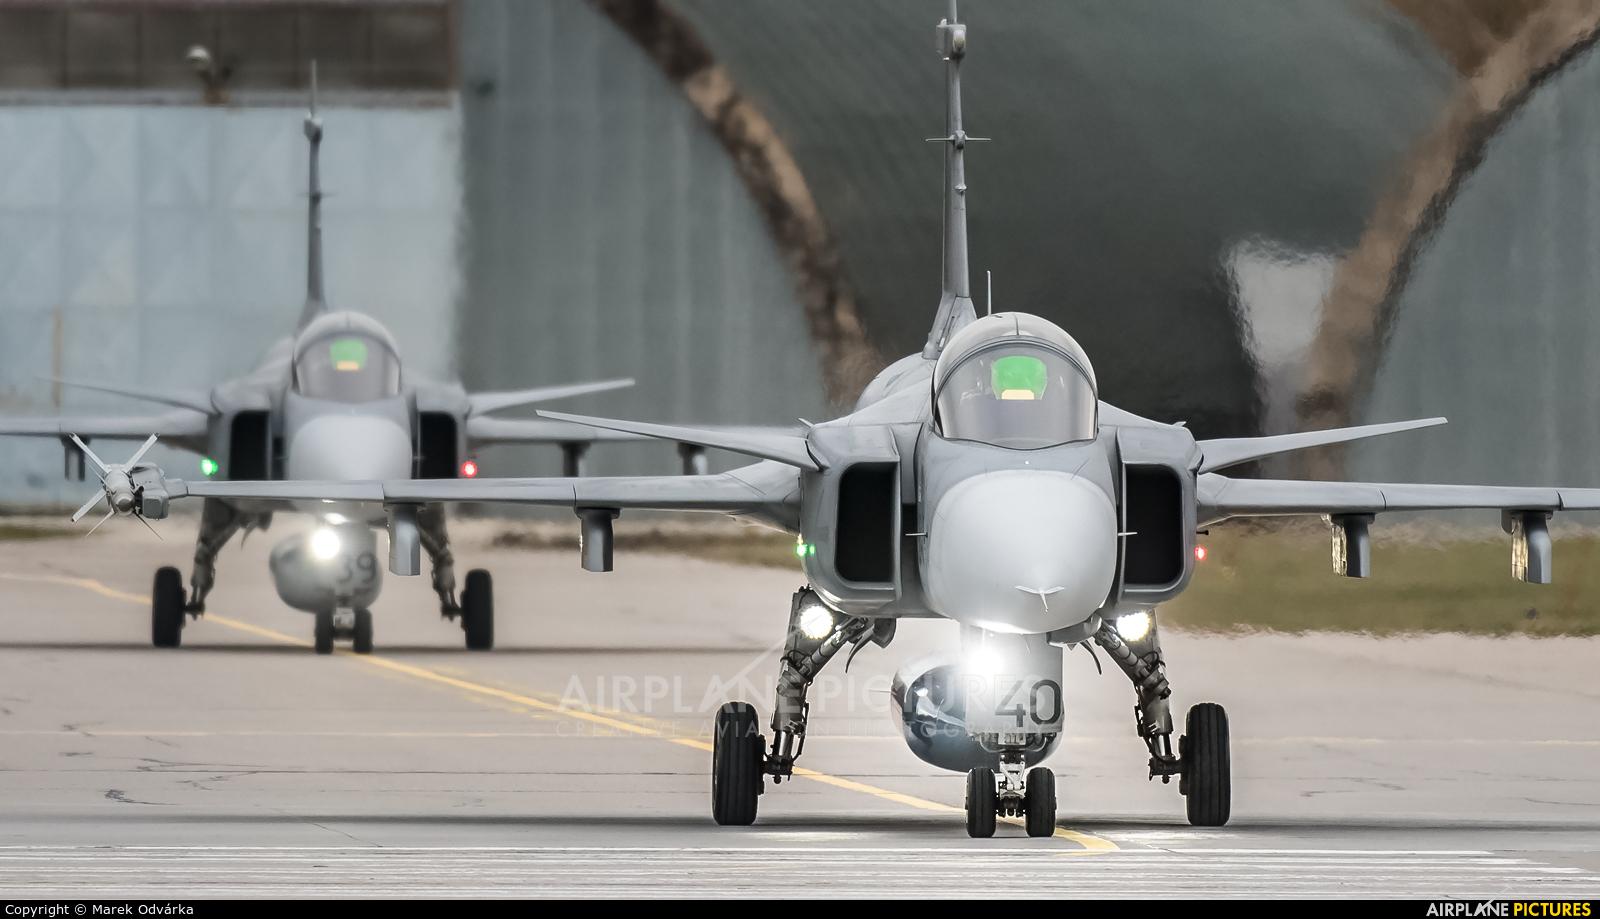 Czech - Air Force 9240 aircraft at Pardubice